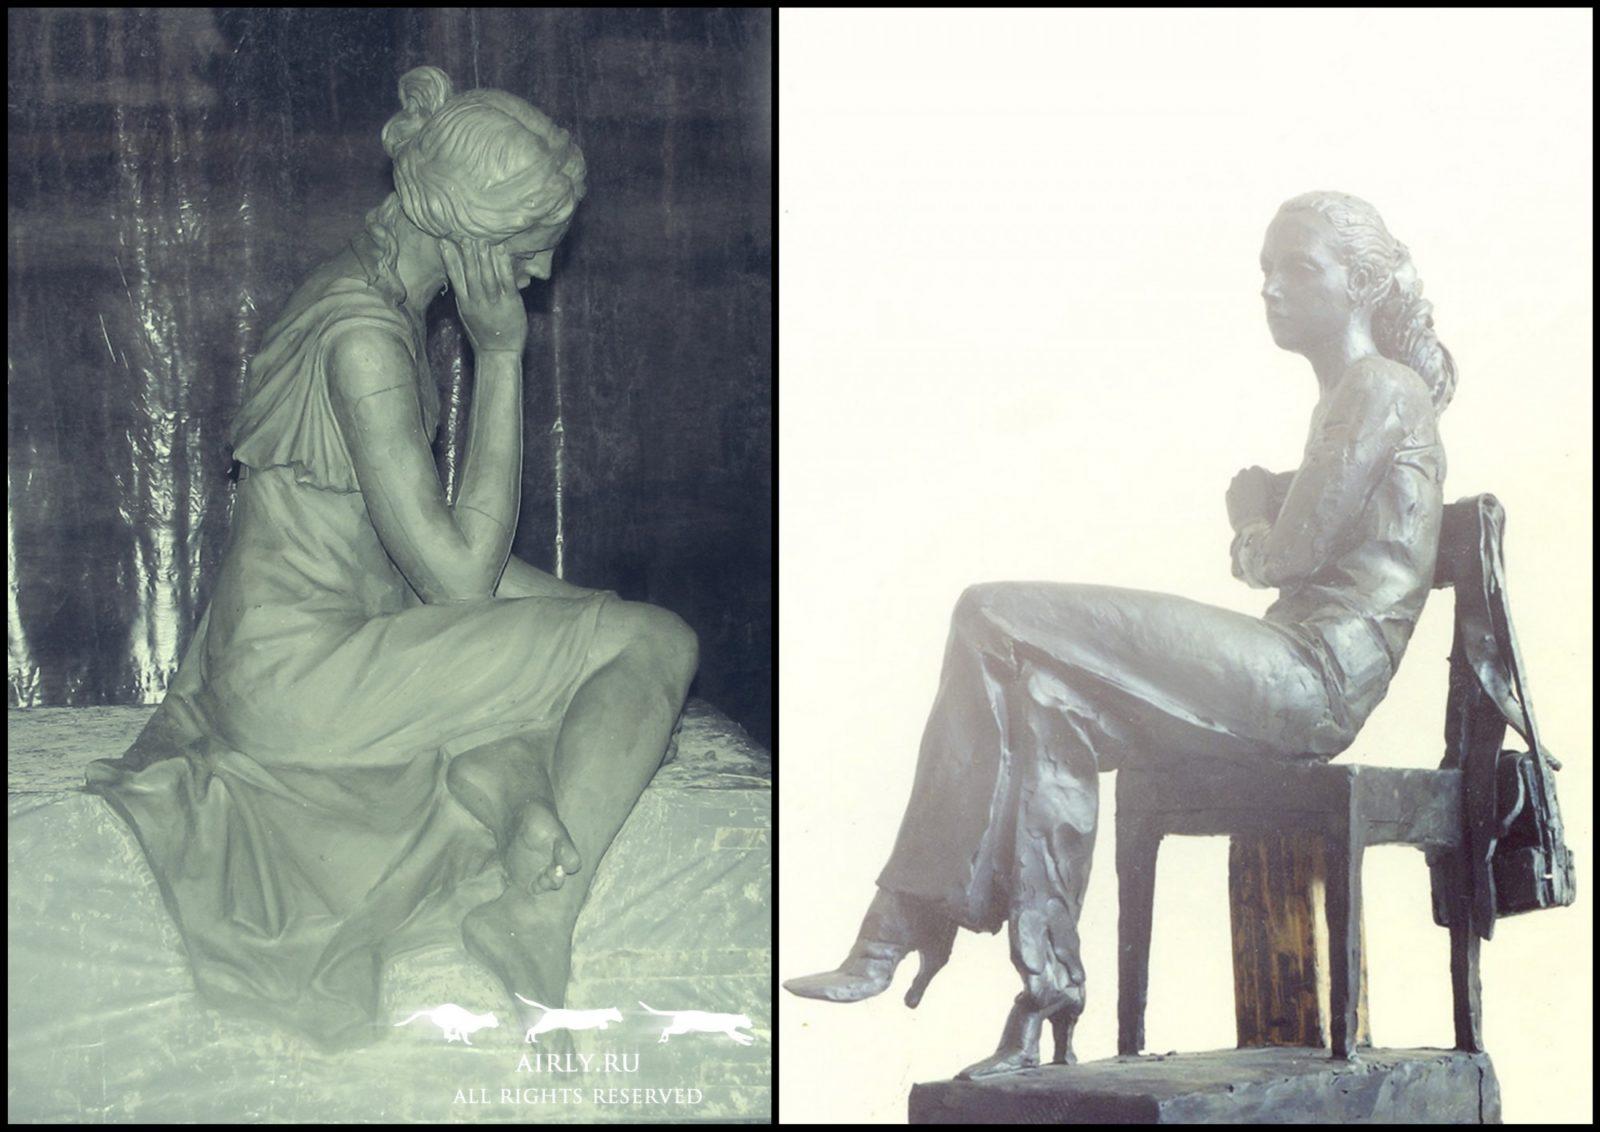 skulpt00012